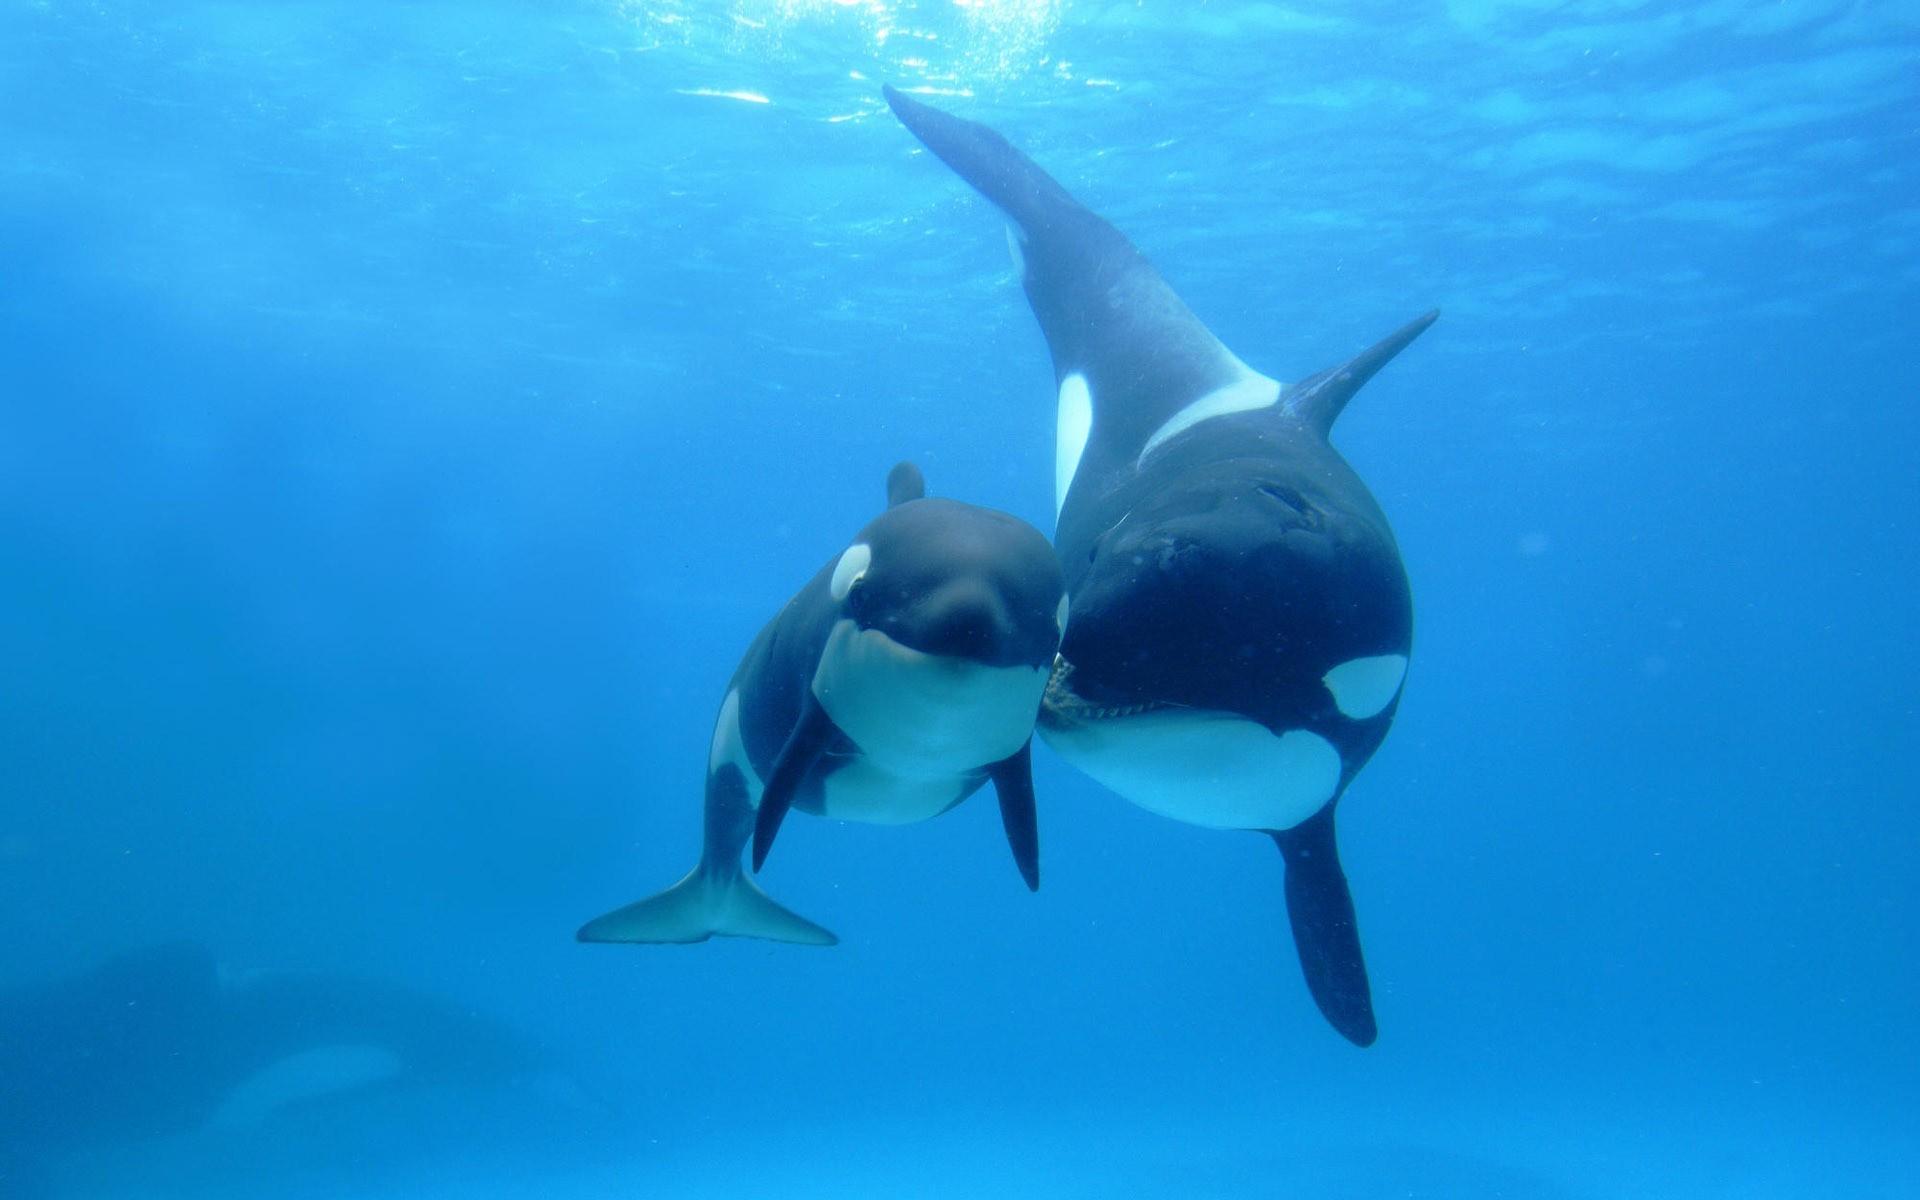 Ocean Sea Wallpaper Ocean, Sea, Animals, Fish, Whales, Orca,